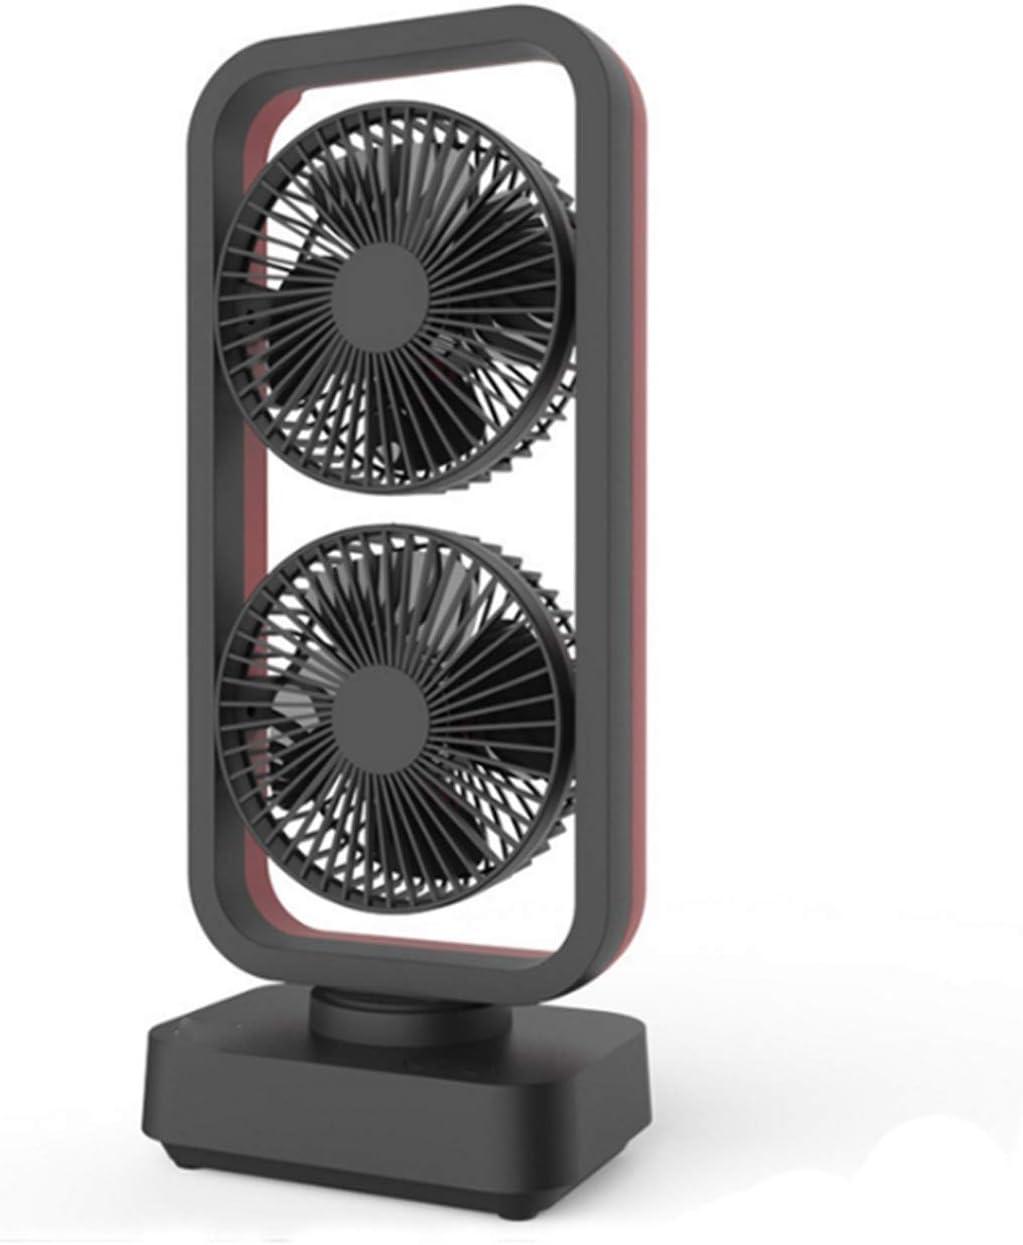 Air Cooling Fan USB Mini Double Fan Air Cooler Rechargeable Portable Cooling Table Desktop Fan for Home Office Color : Blue Black